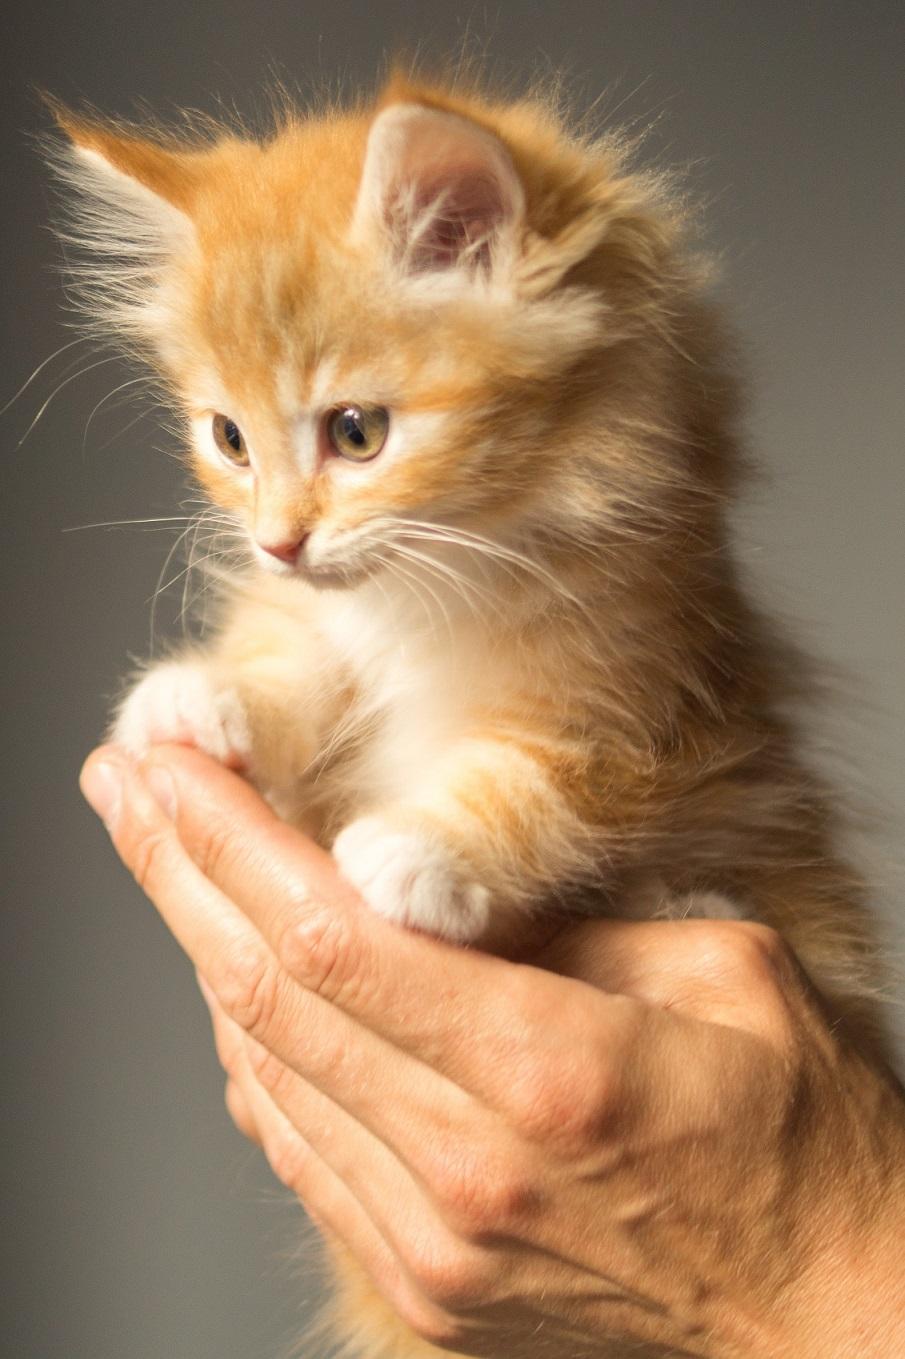 animal-cute-kitten-cat-50-80.jpg